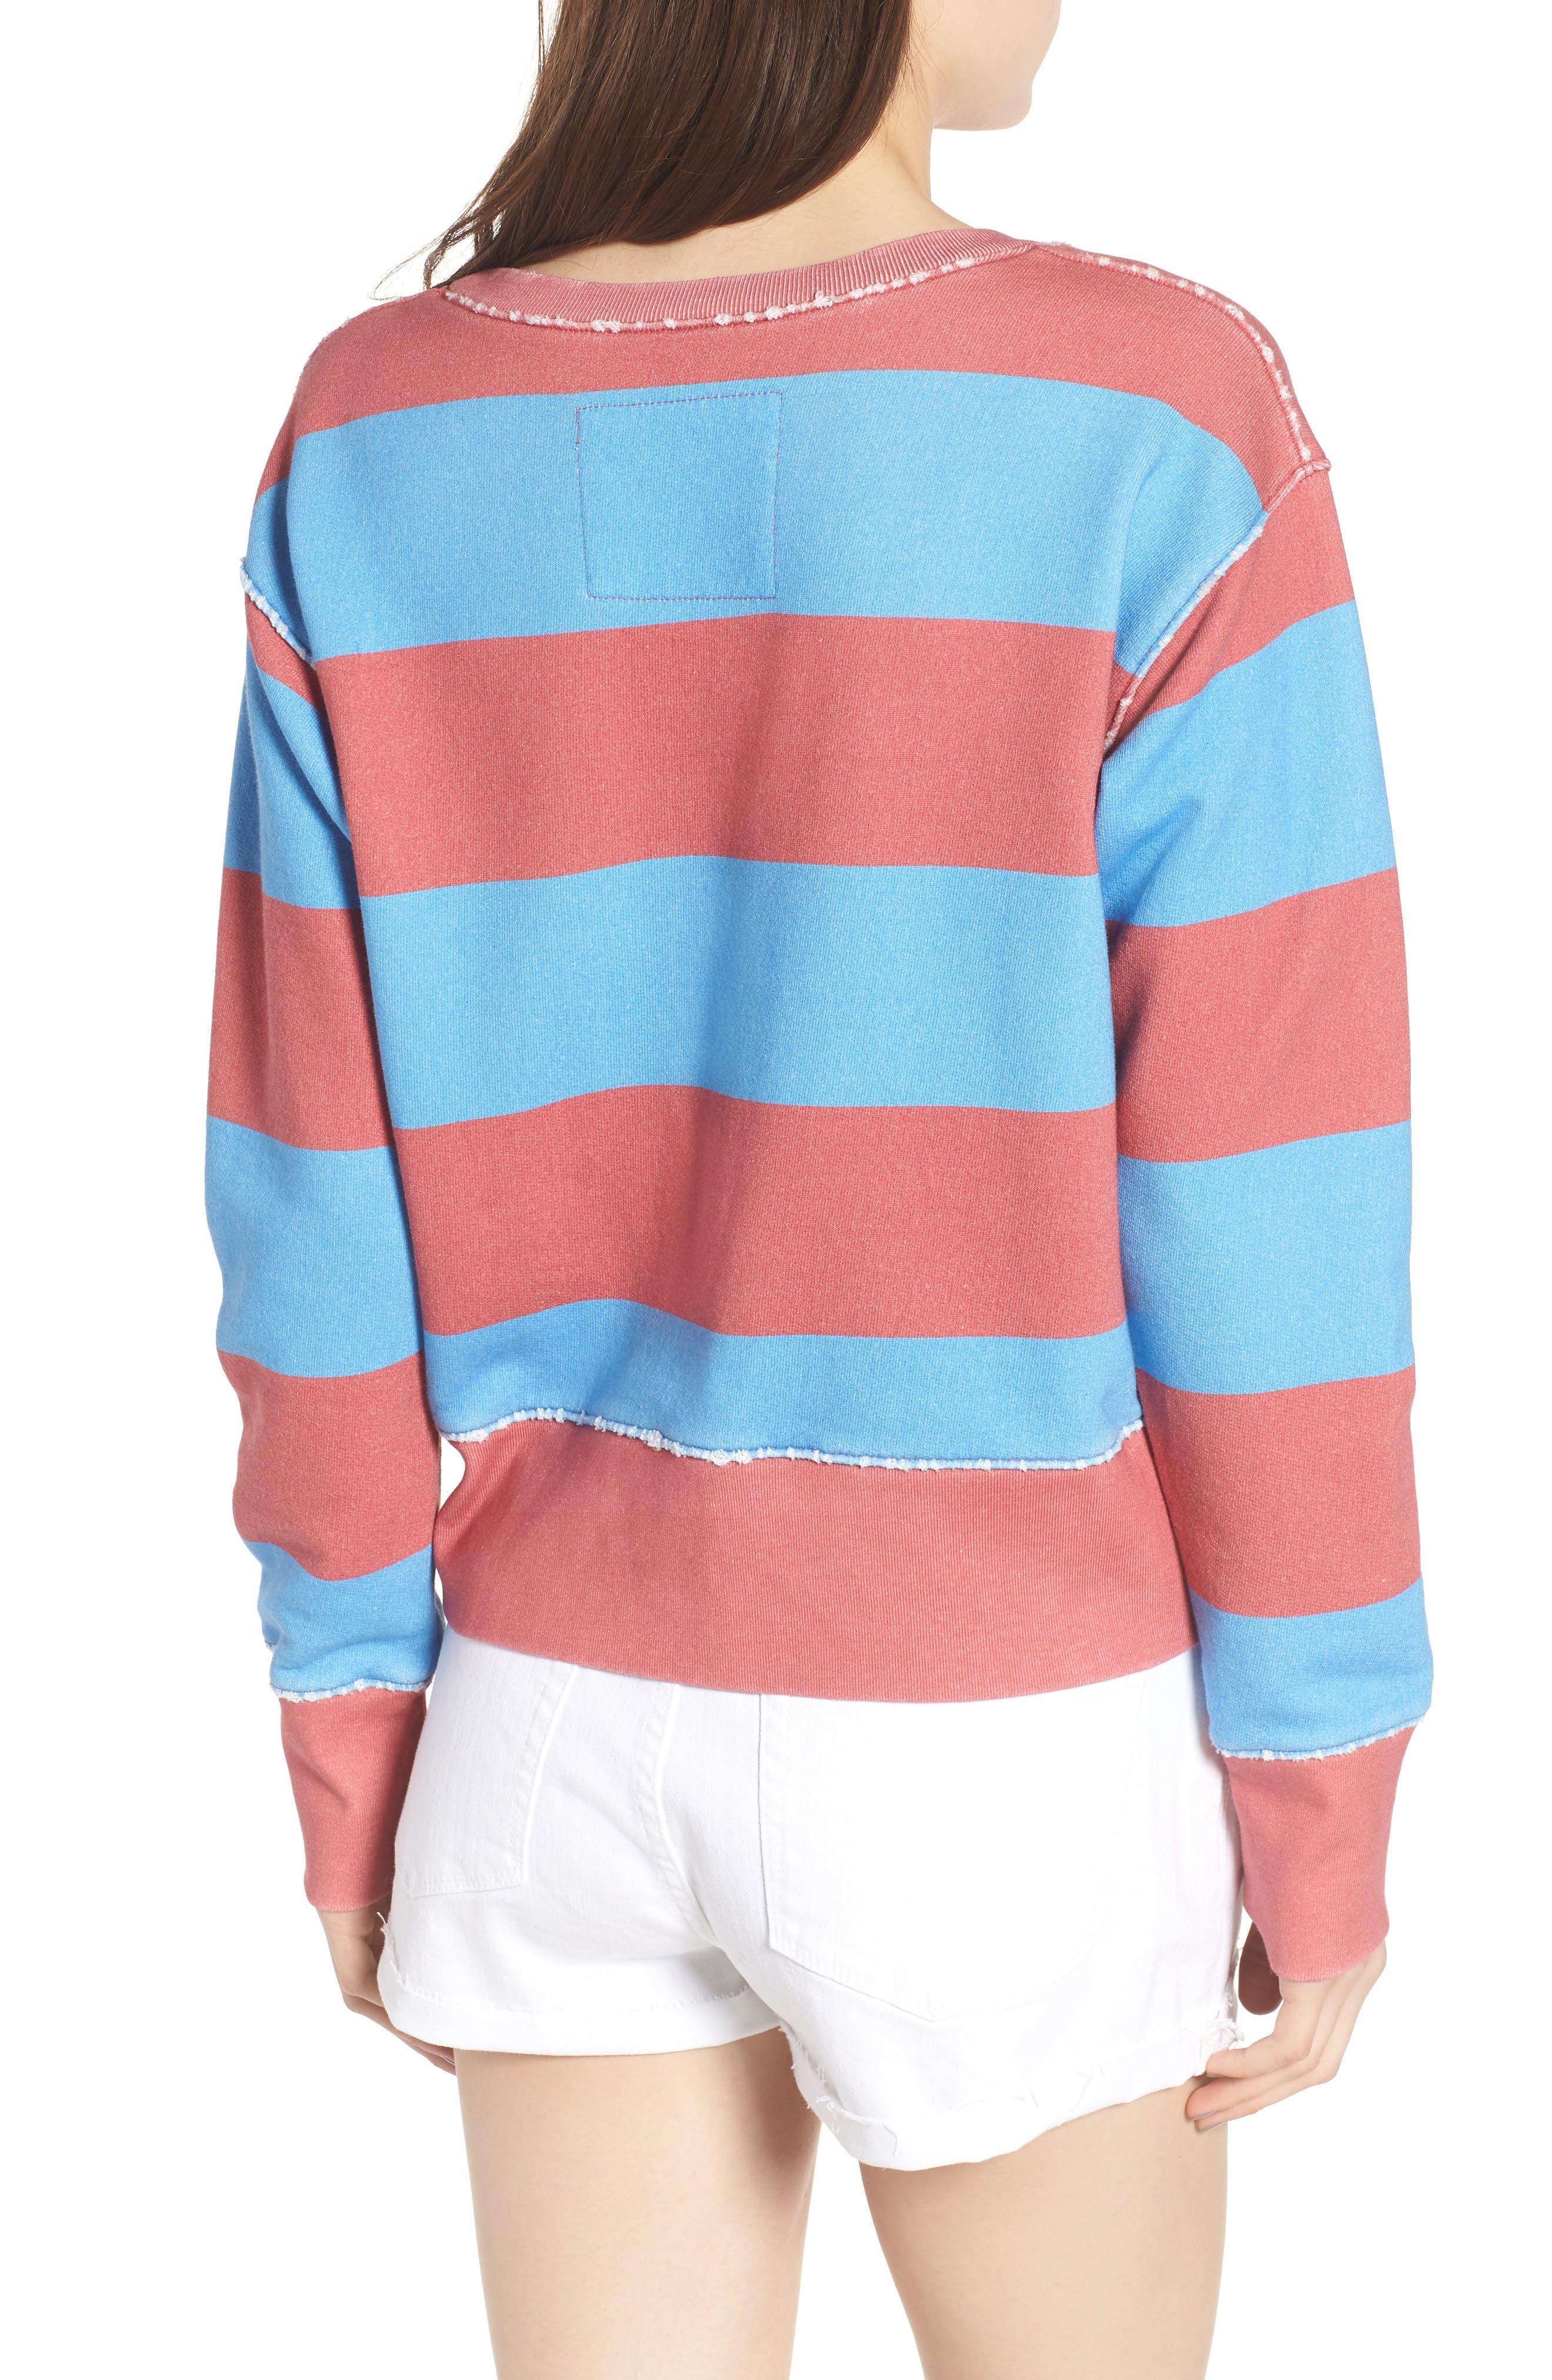 Stripe Crewneck Sweatshirt,                             Alternate thumbnail 2, color,                             Red Rugby 5 Vintage Year Wash